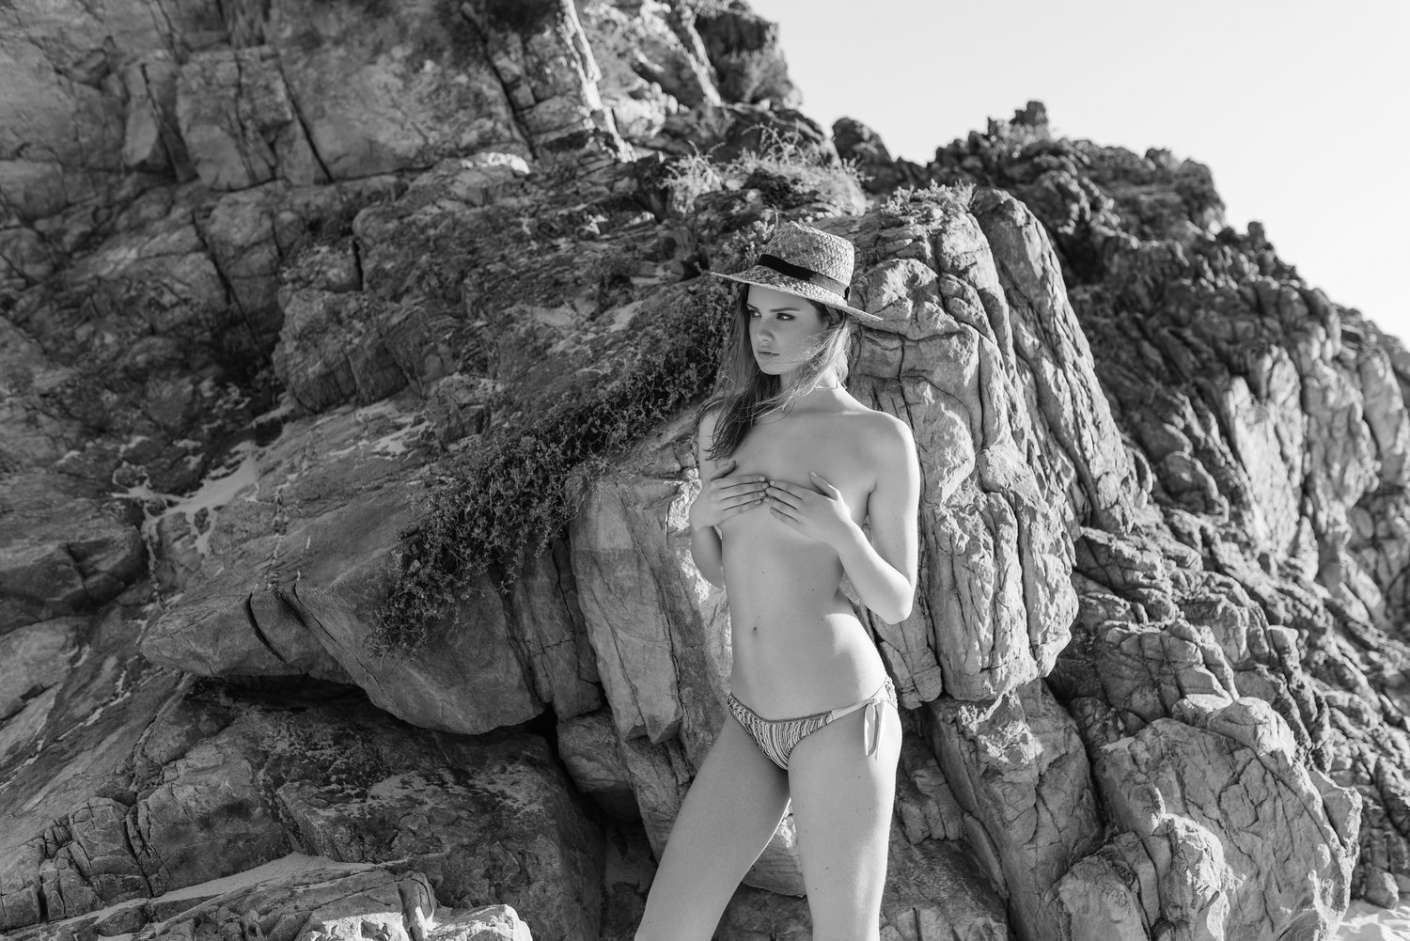 Feet Mirthe Dijkstra nude (21 photos), Topless, Leaked, Selfie, underwear 2020